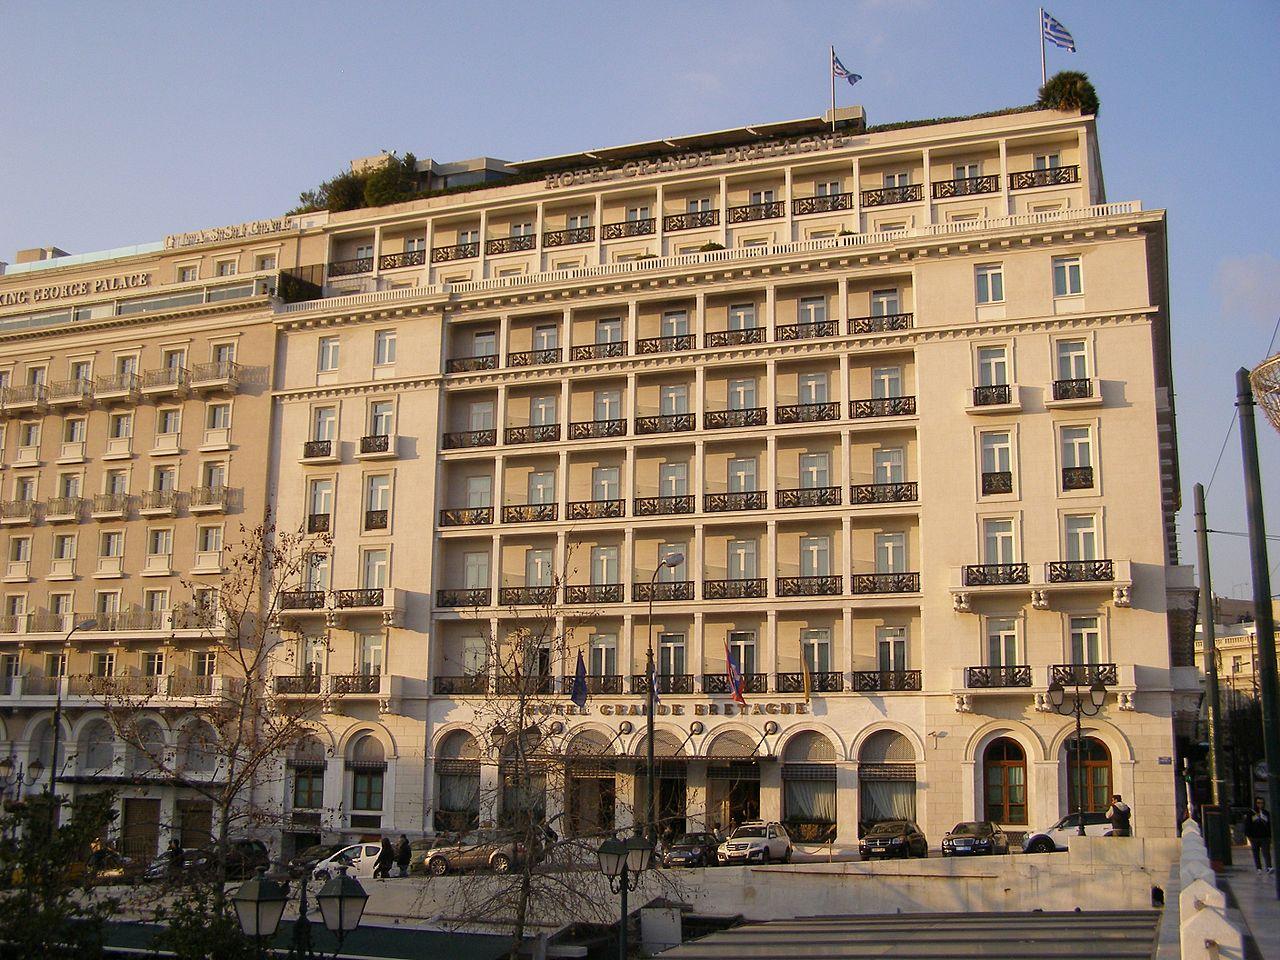 Hotel Grand Bretagne Hotelvergleich